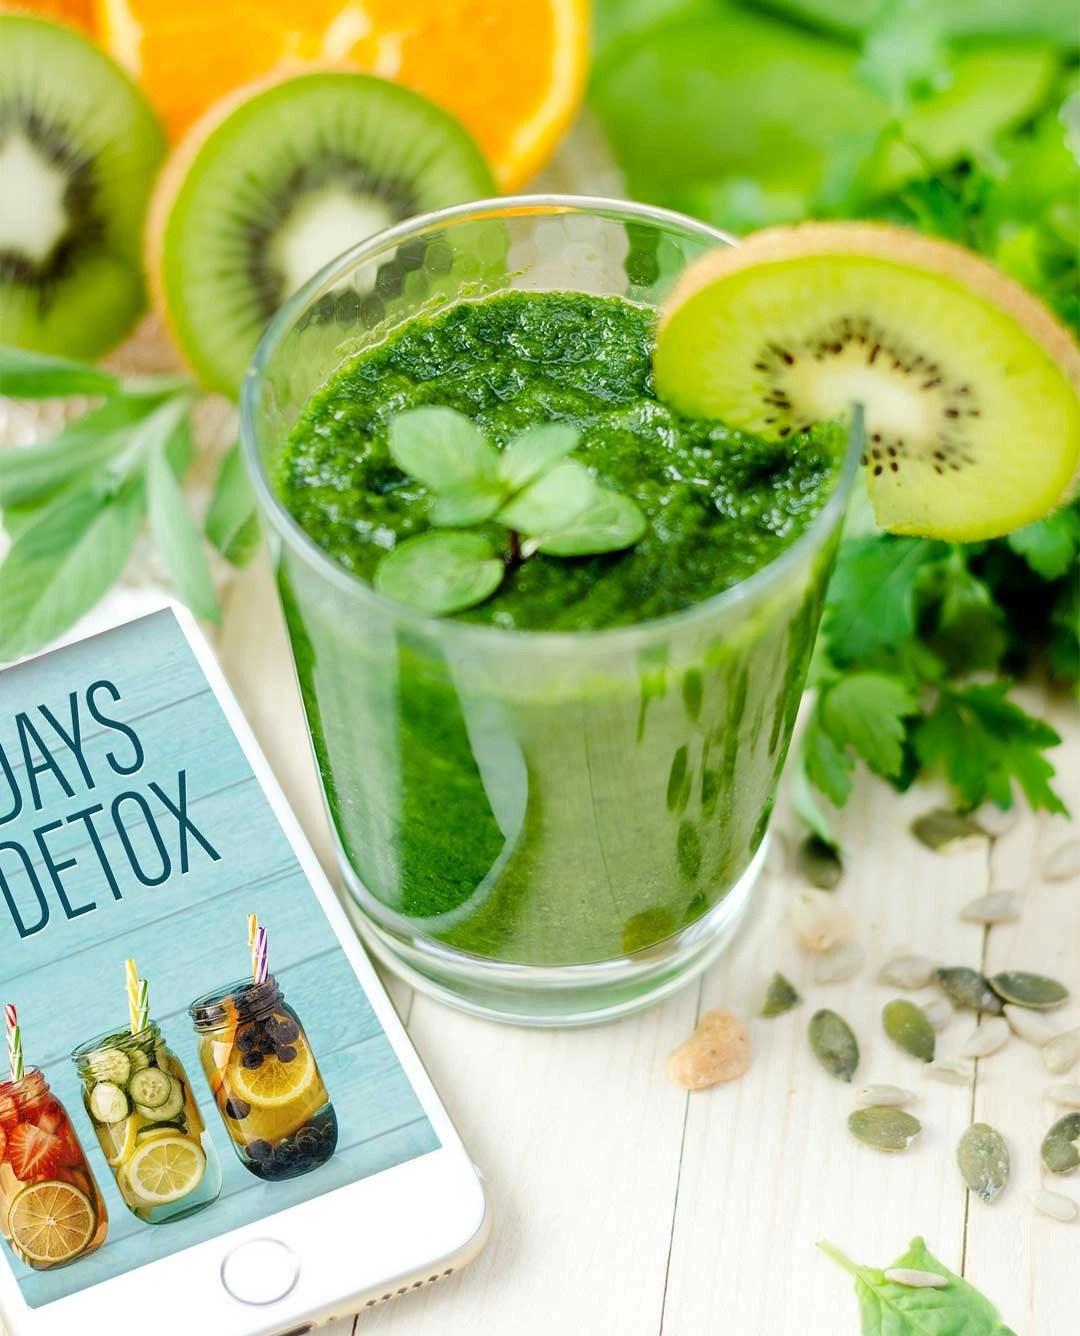 The Benefits of Detox